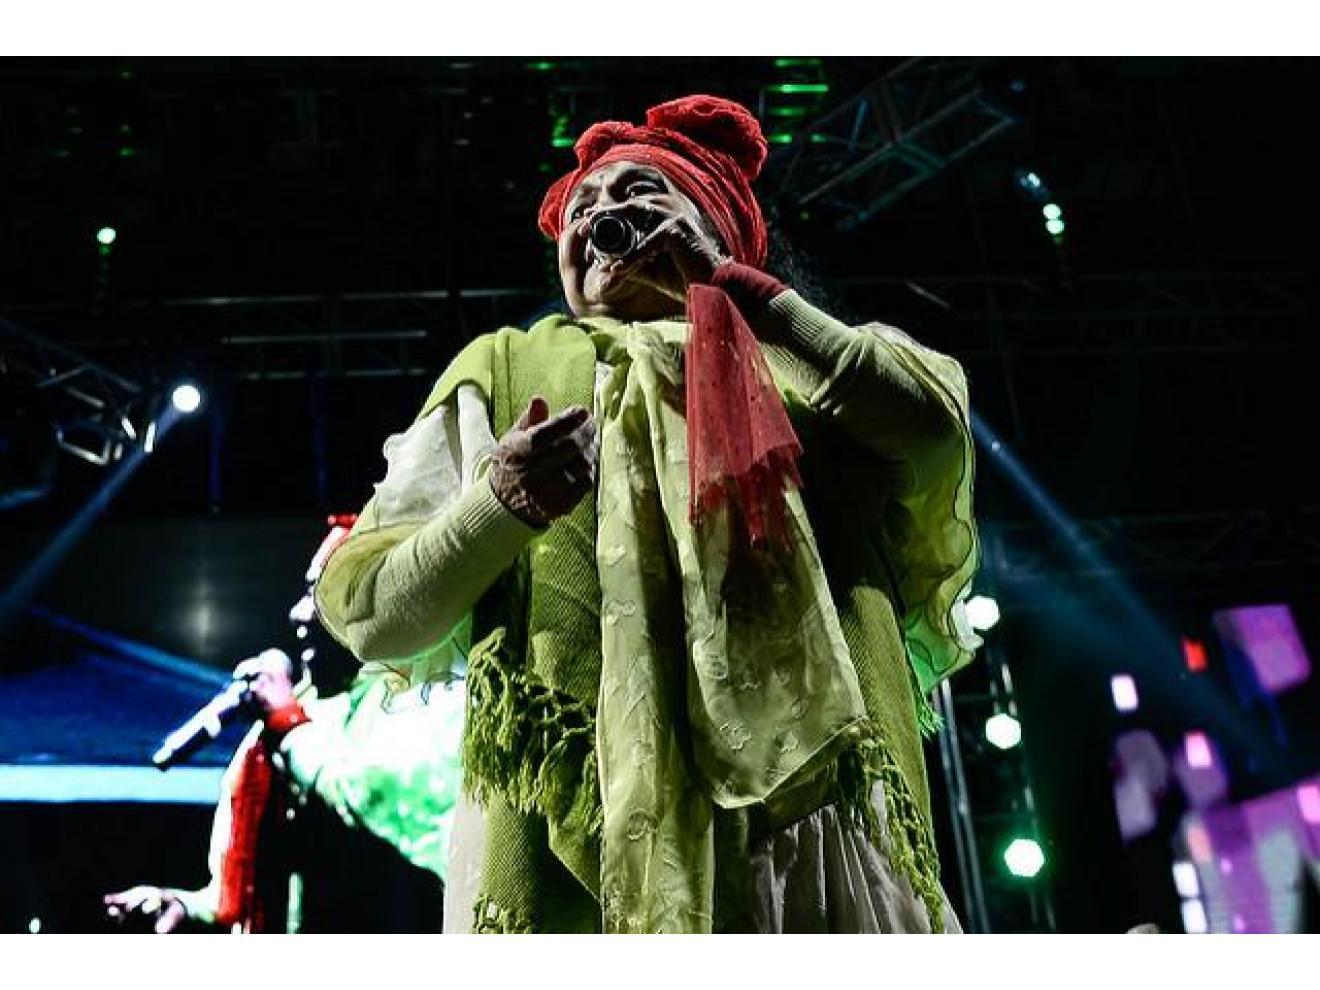 Toto la Momposina singing in Colombia al Parque